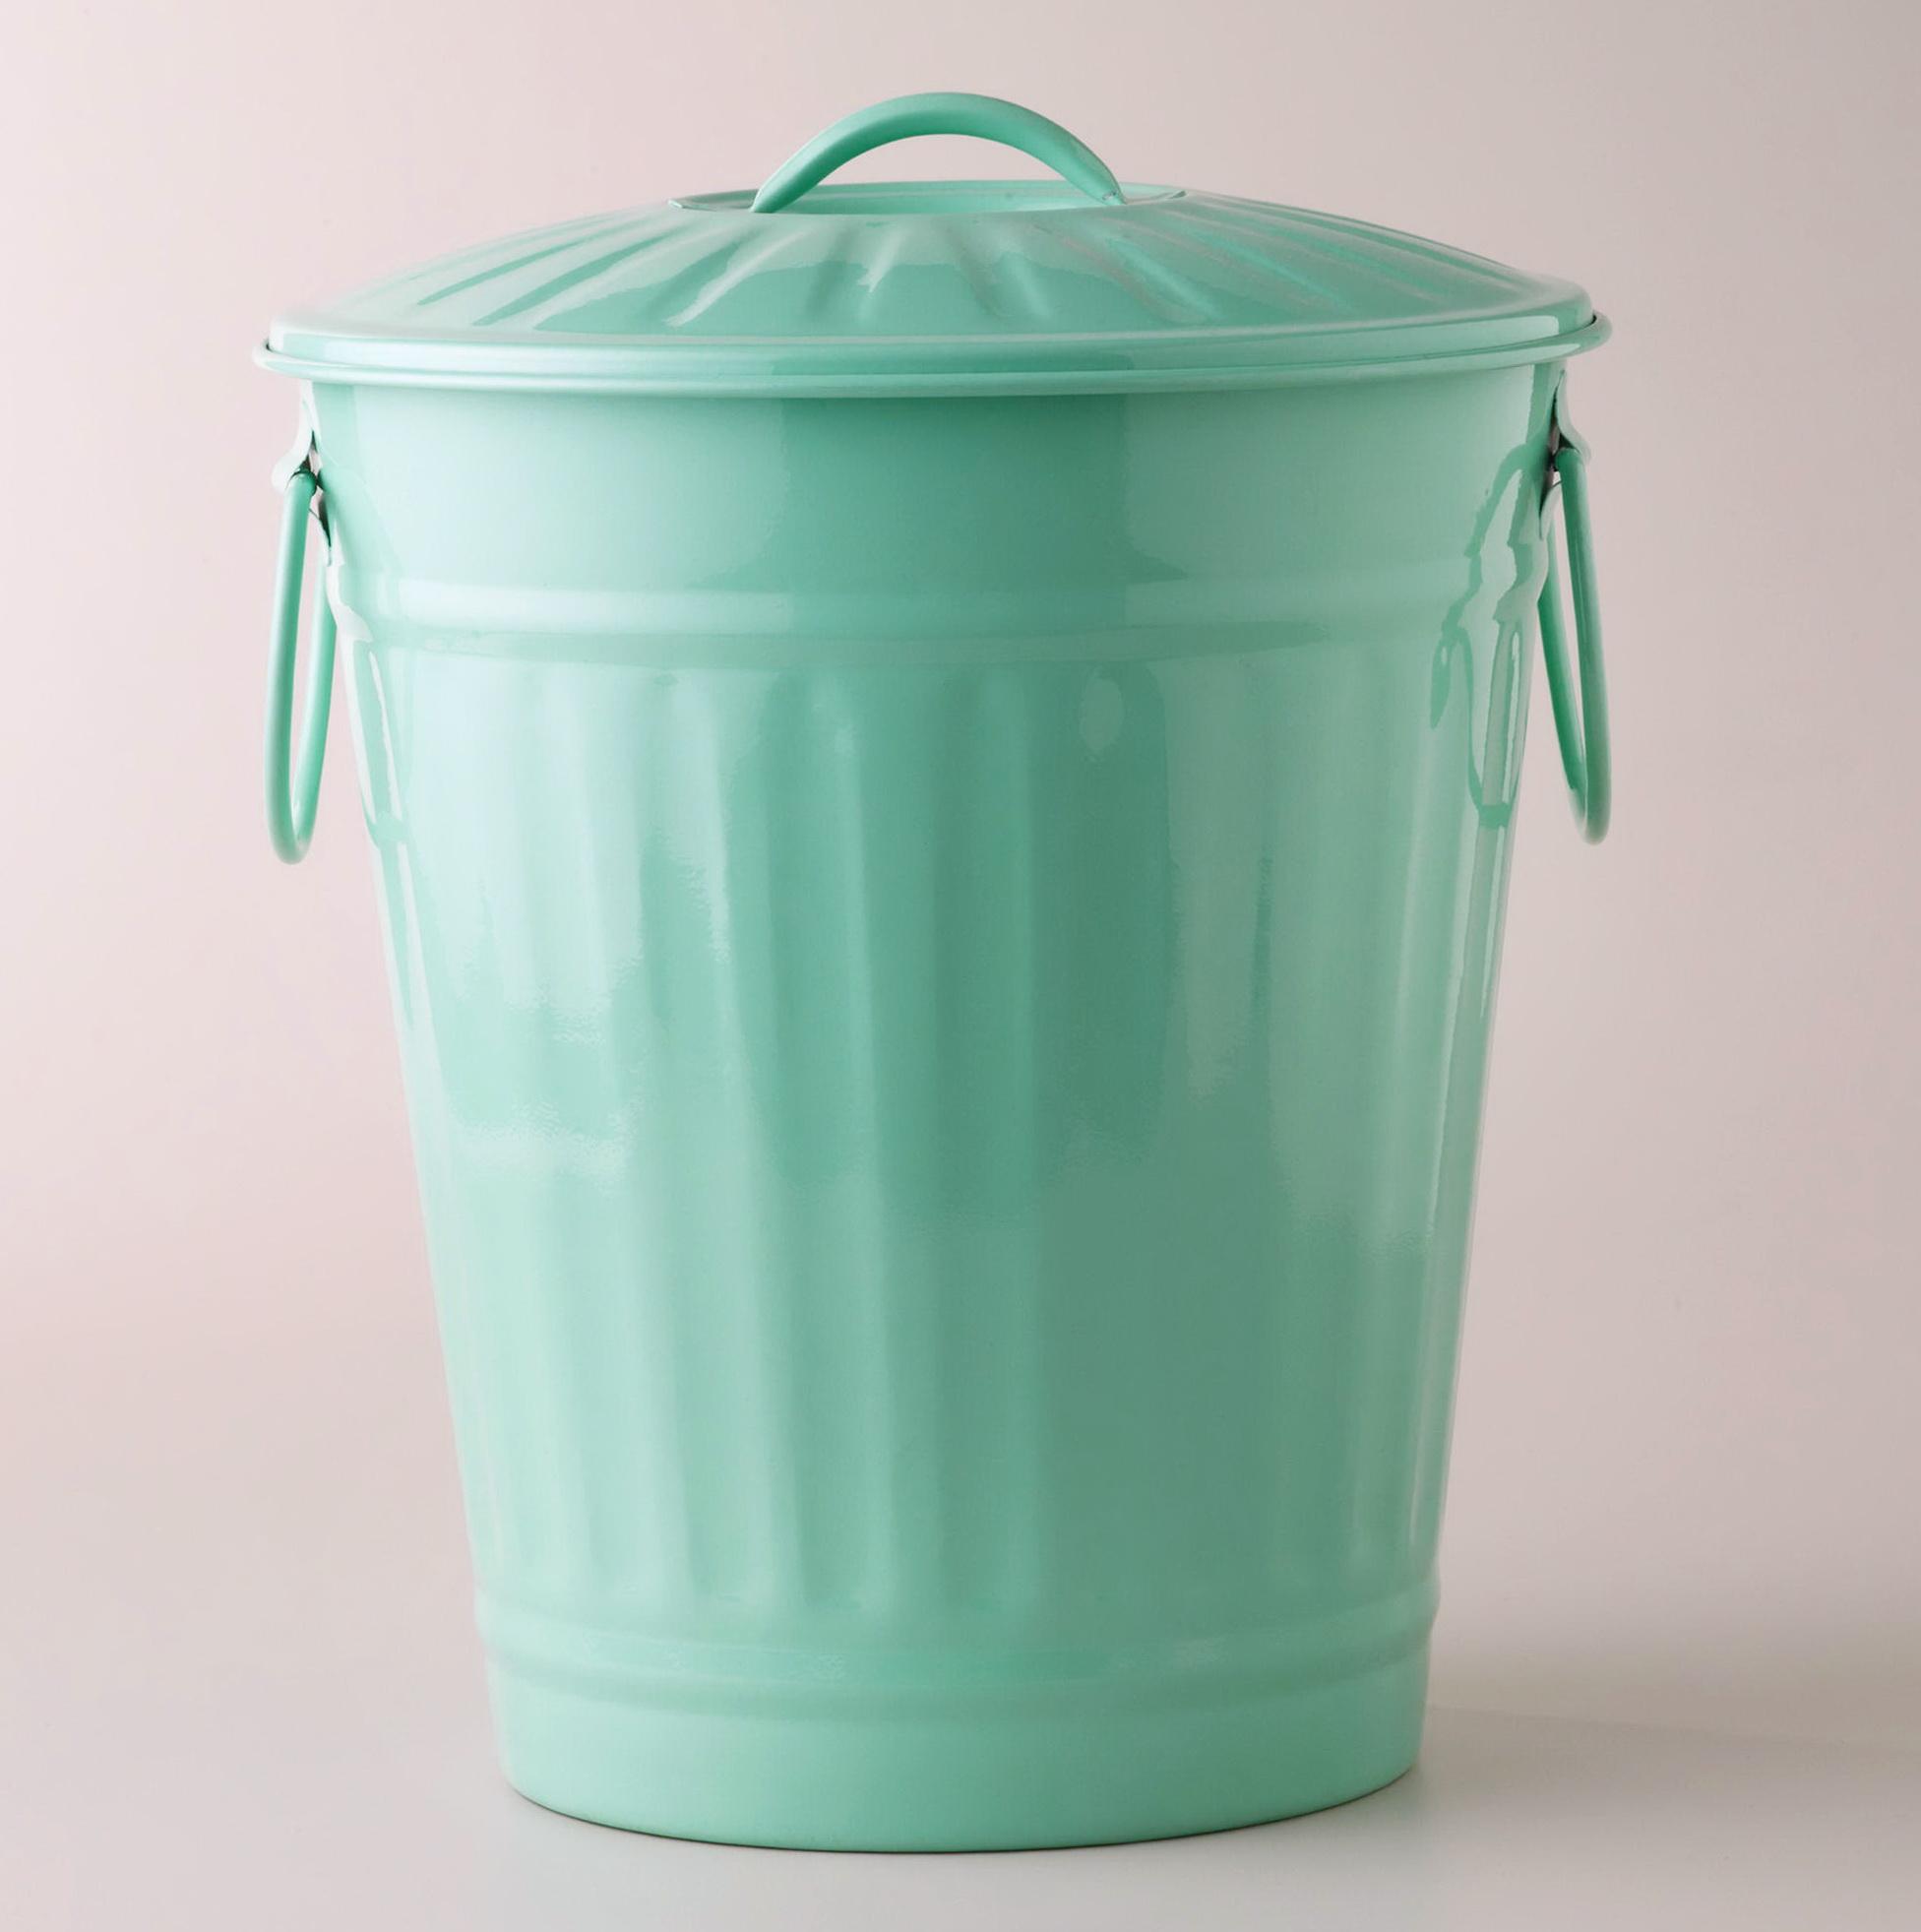 Retro Kitchen Trash Cans